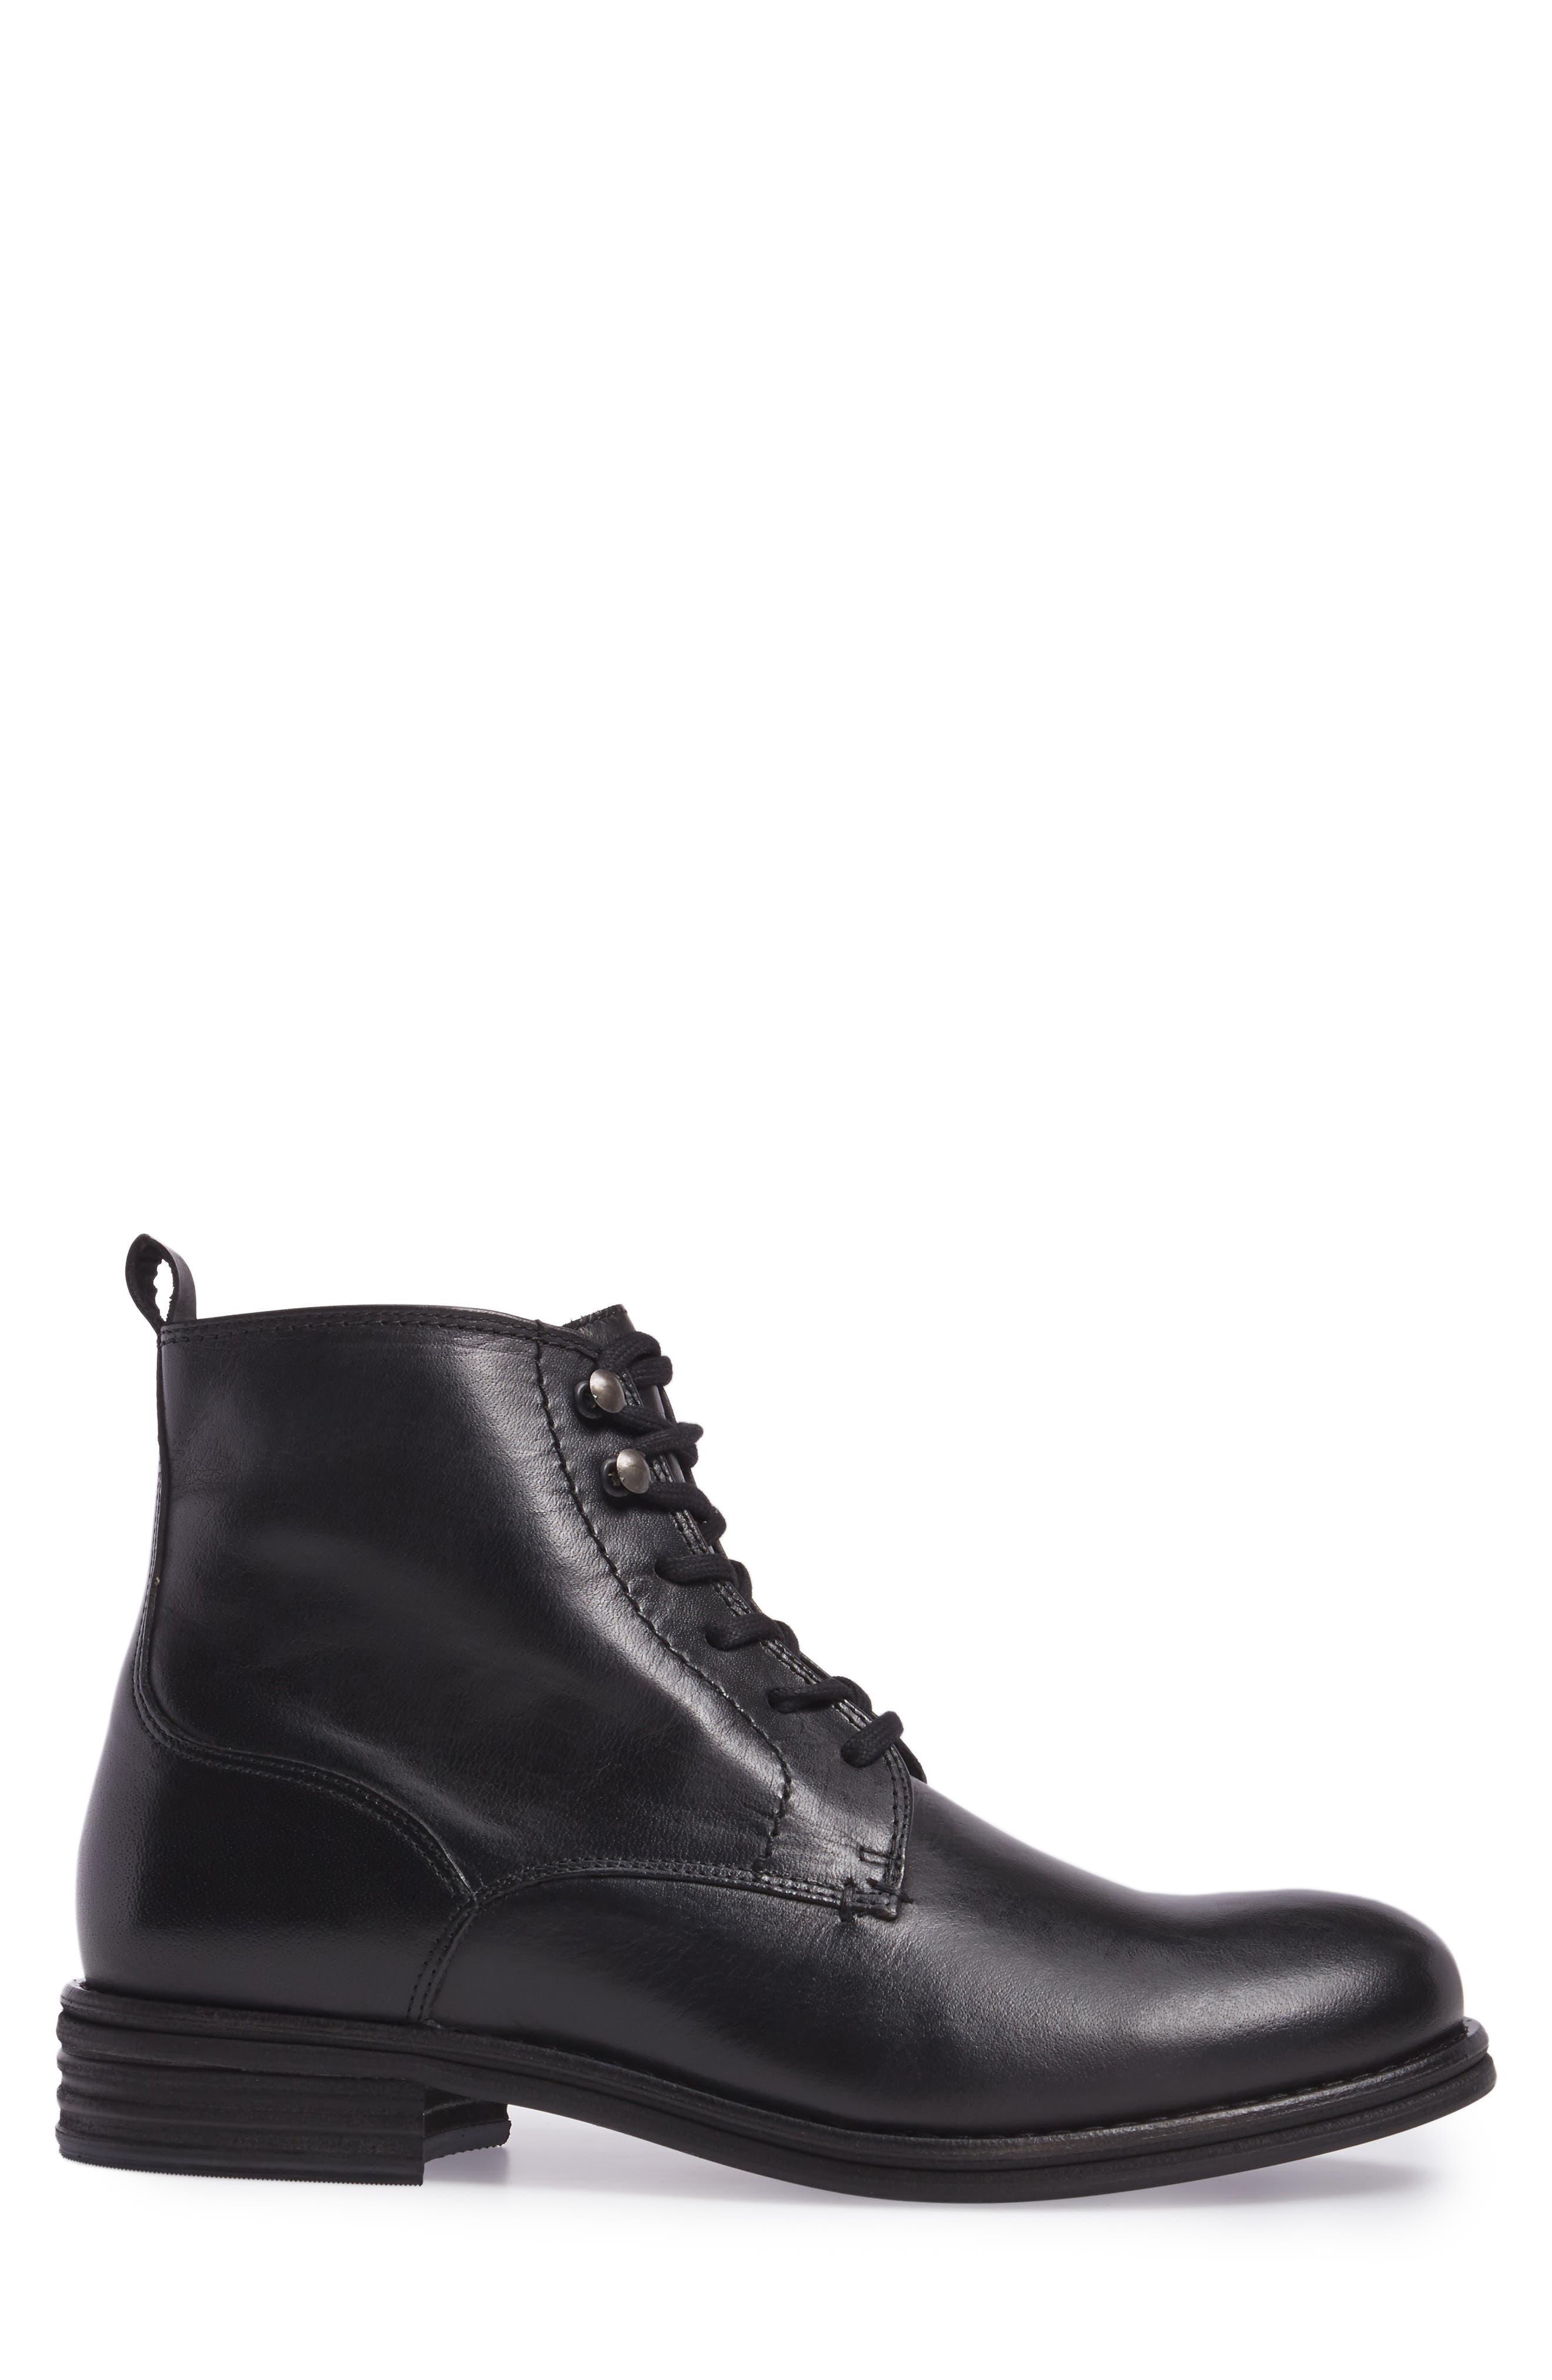 Cordie Plain Toe Boot,                             Alternate thumbnail 3, color,                             001